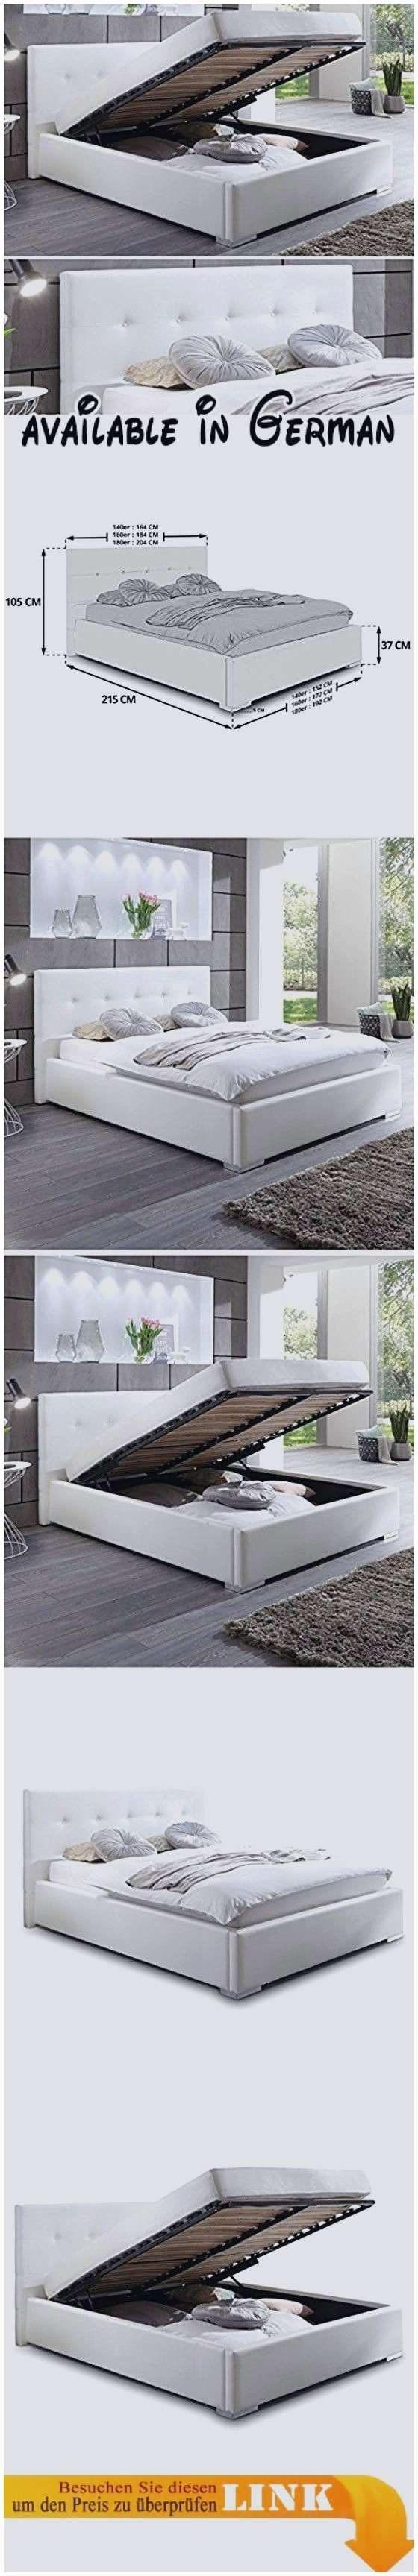 Luxe Lit Ikea 140—190 Nouveau Ikea Matelas Latex Nouveau Allo